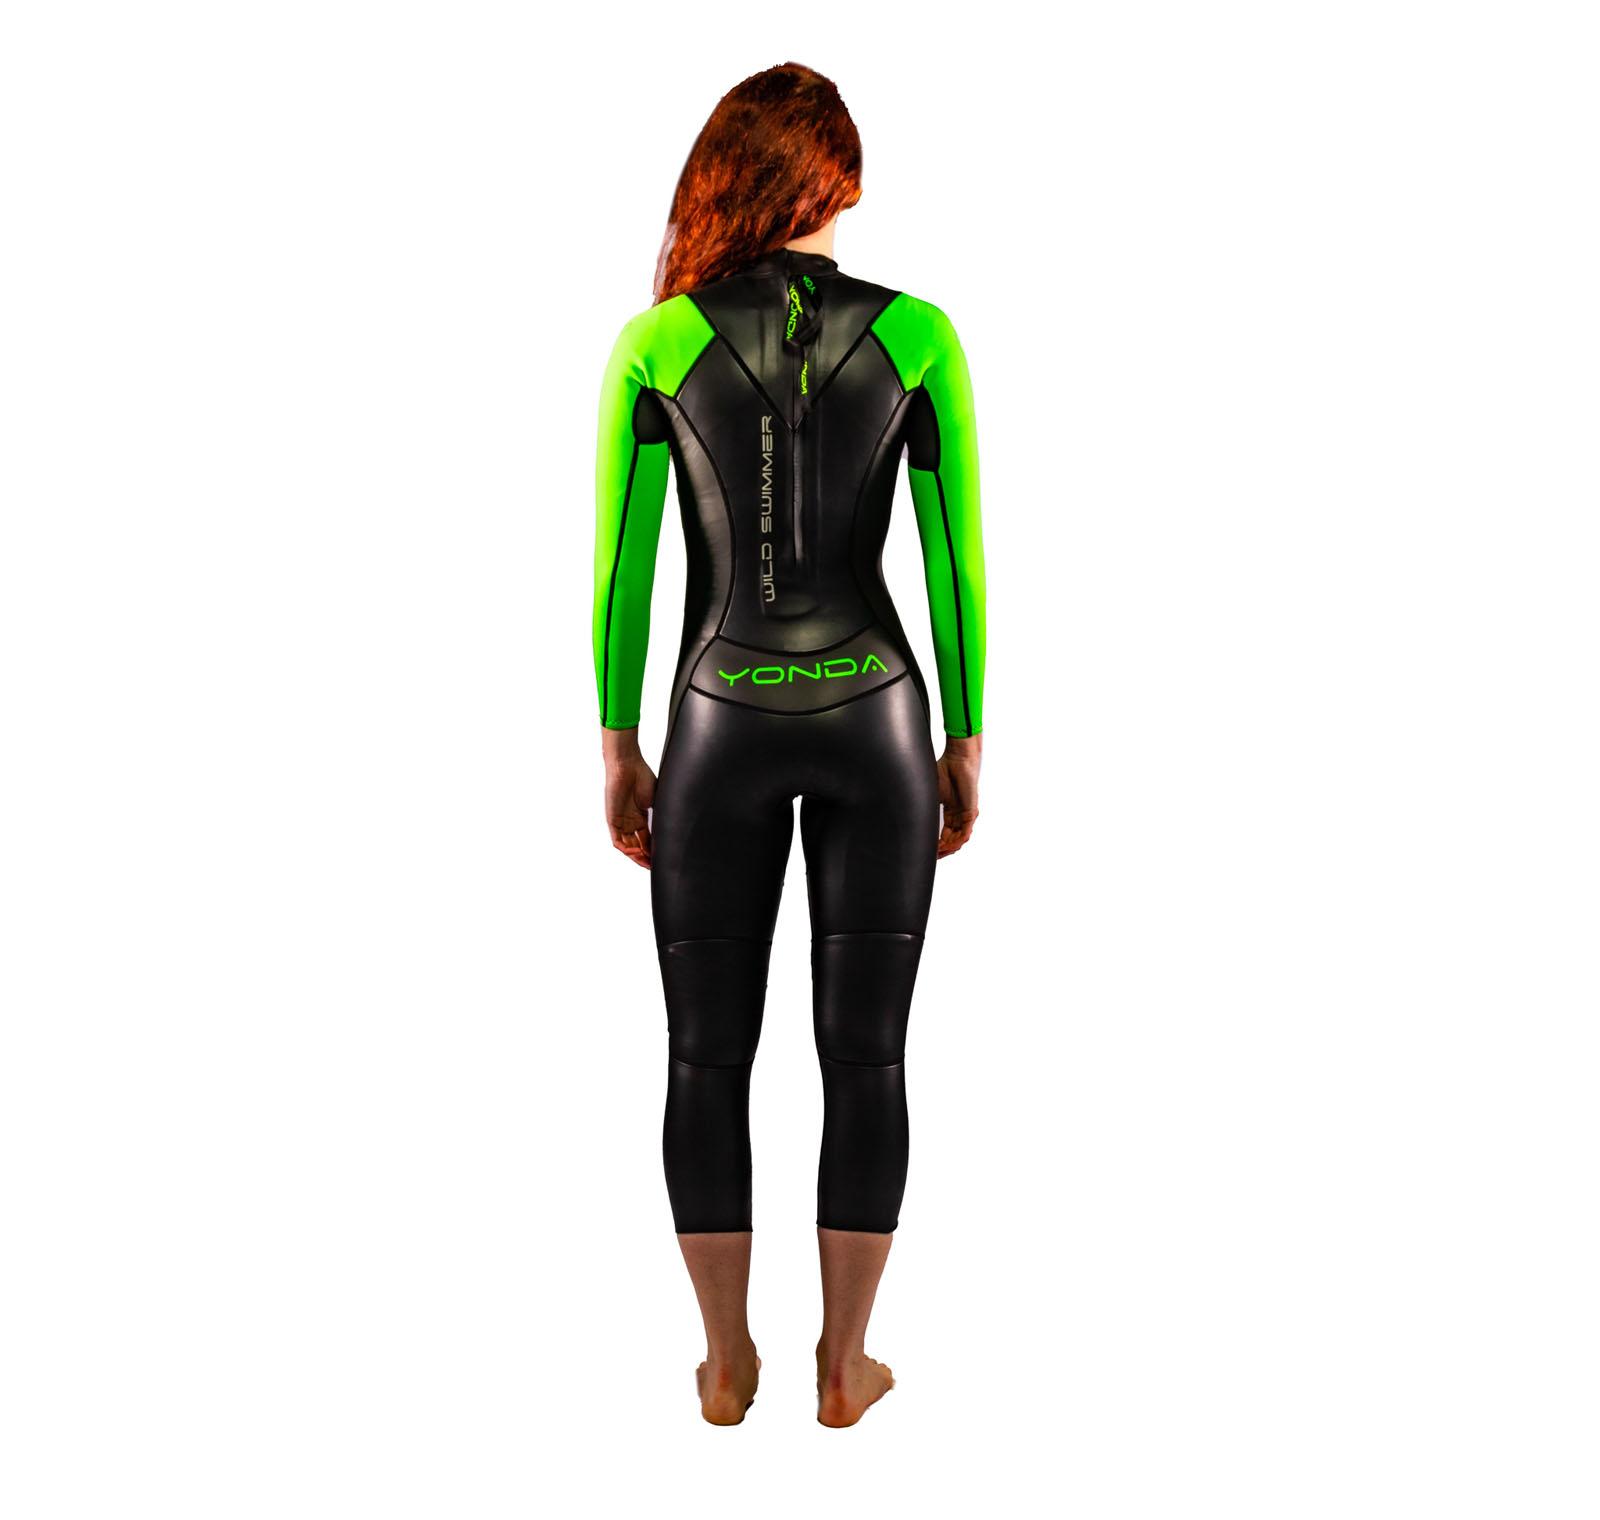 Yonda Spook Wetsuit - Women's Wetsuit